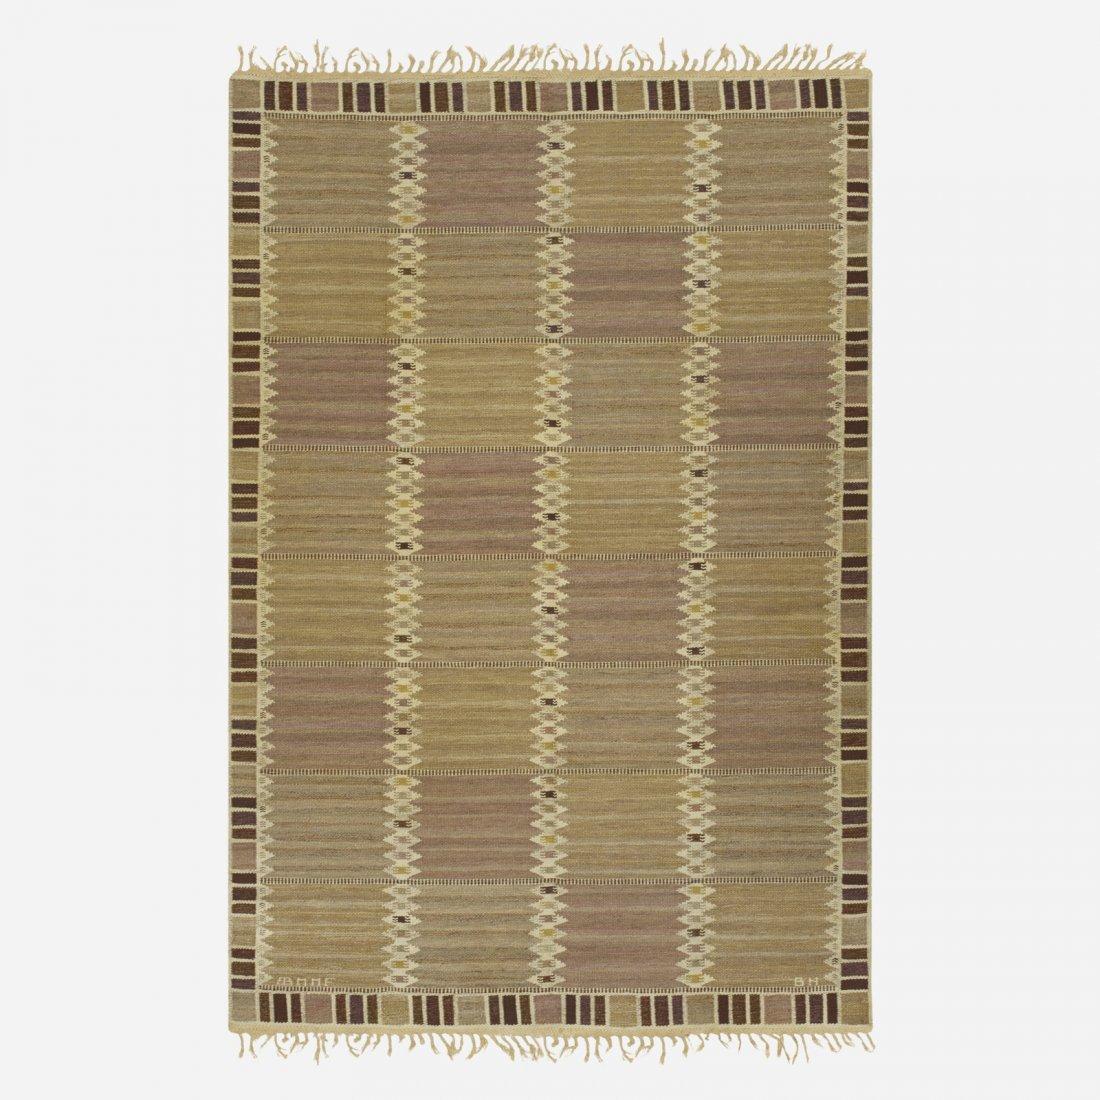 Barbro Nilsson, Salerno flatweave carpet